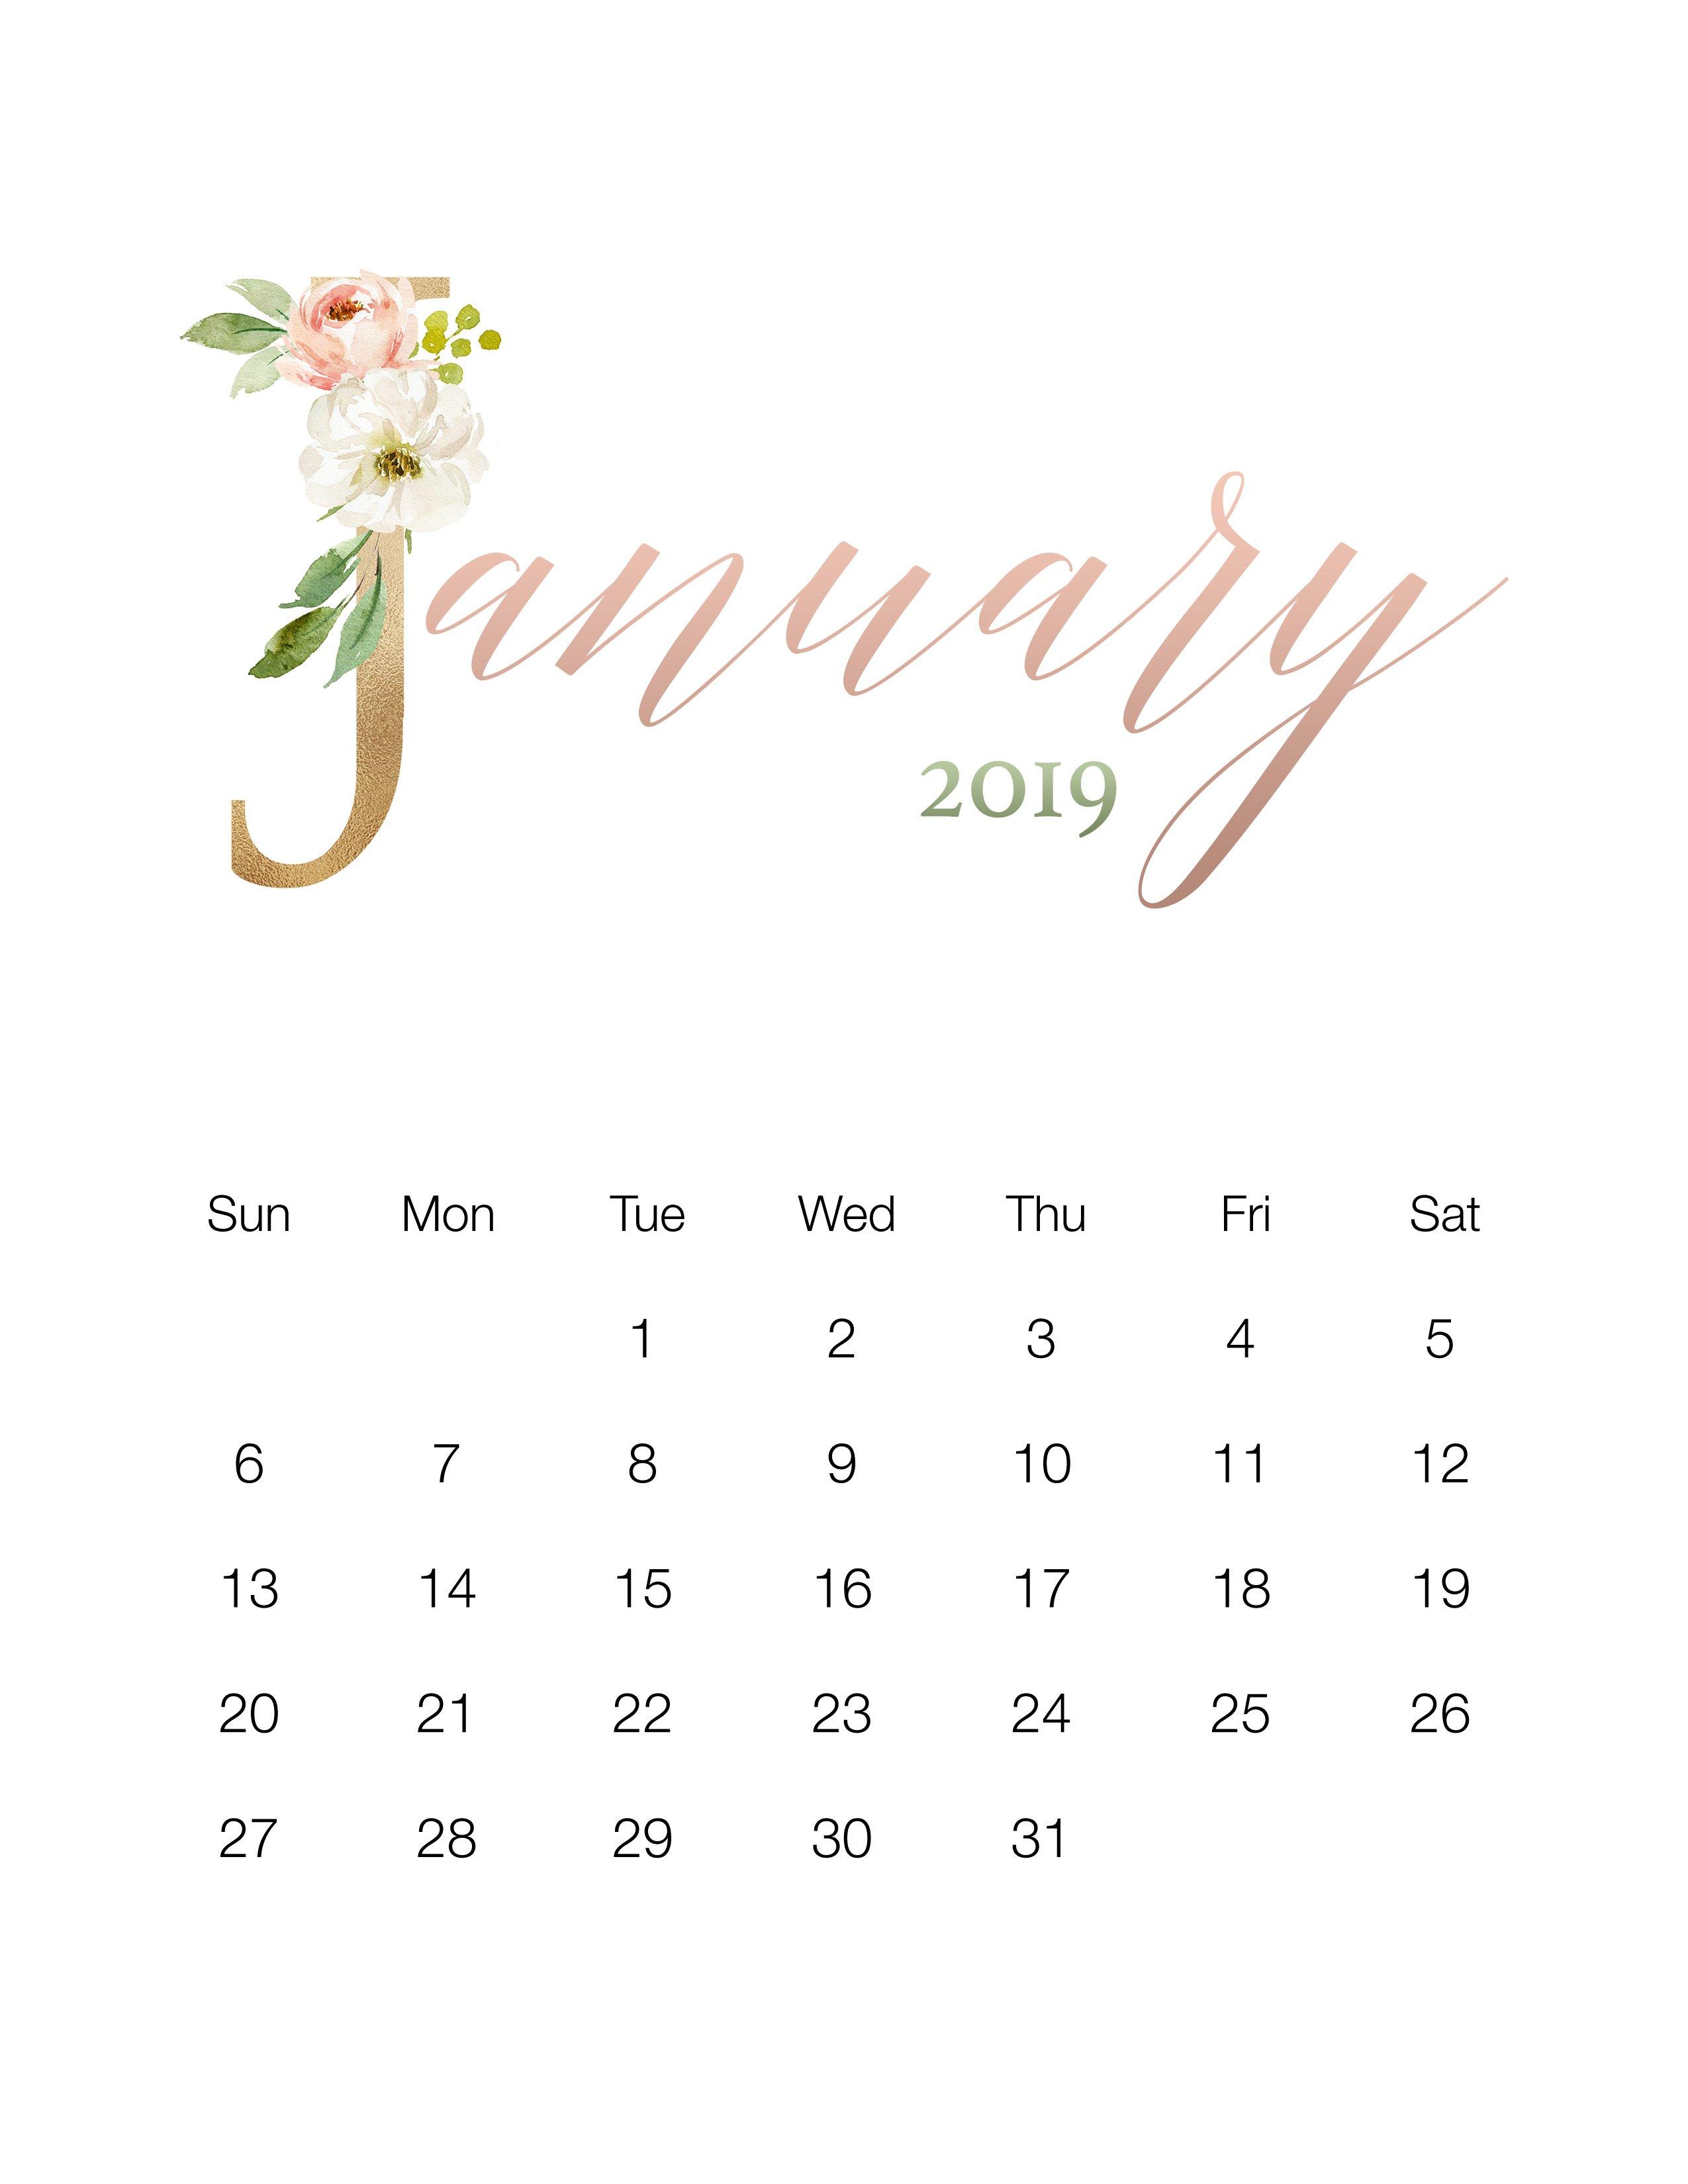 Pretty Floral Free Printable 2019 Calendar - The Cottage Market Calendar 2019 Pretty